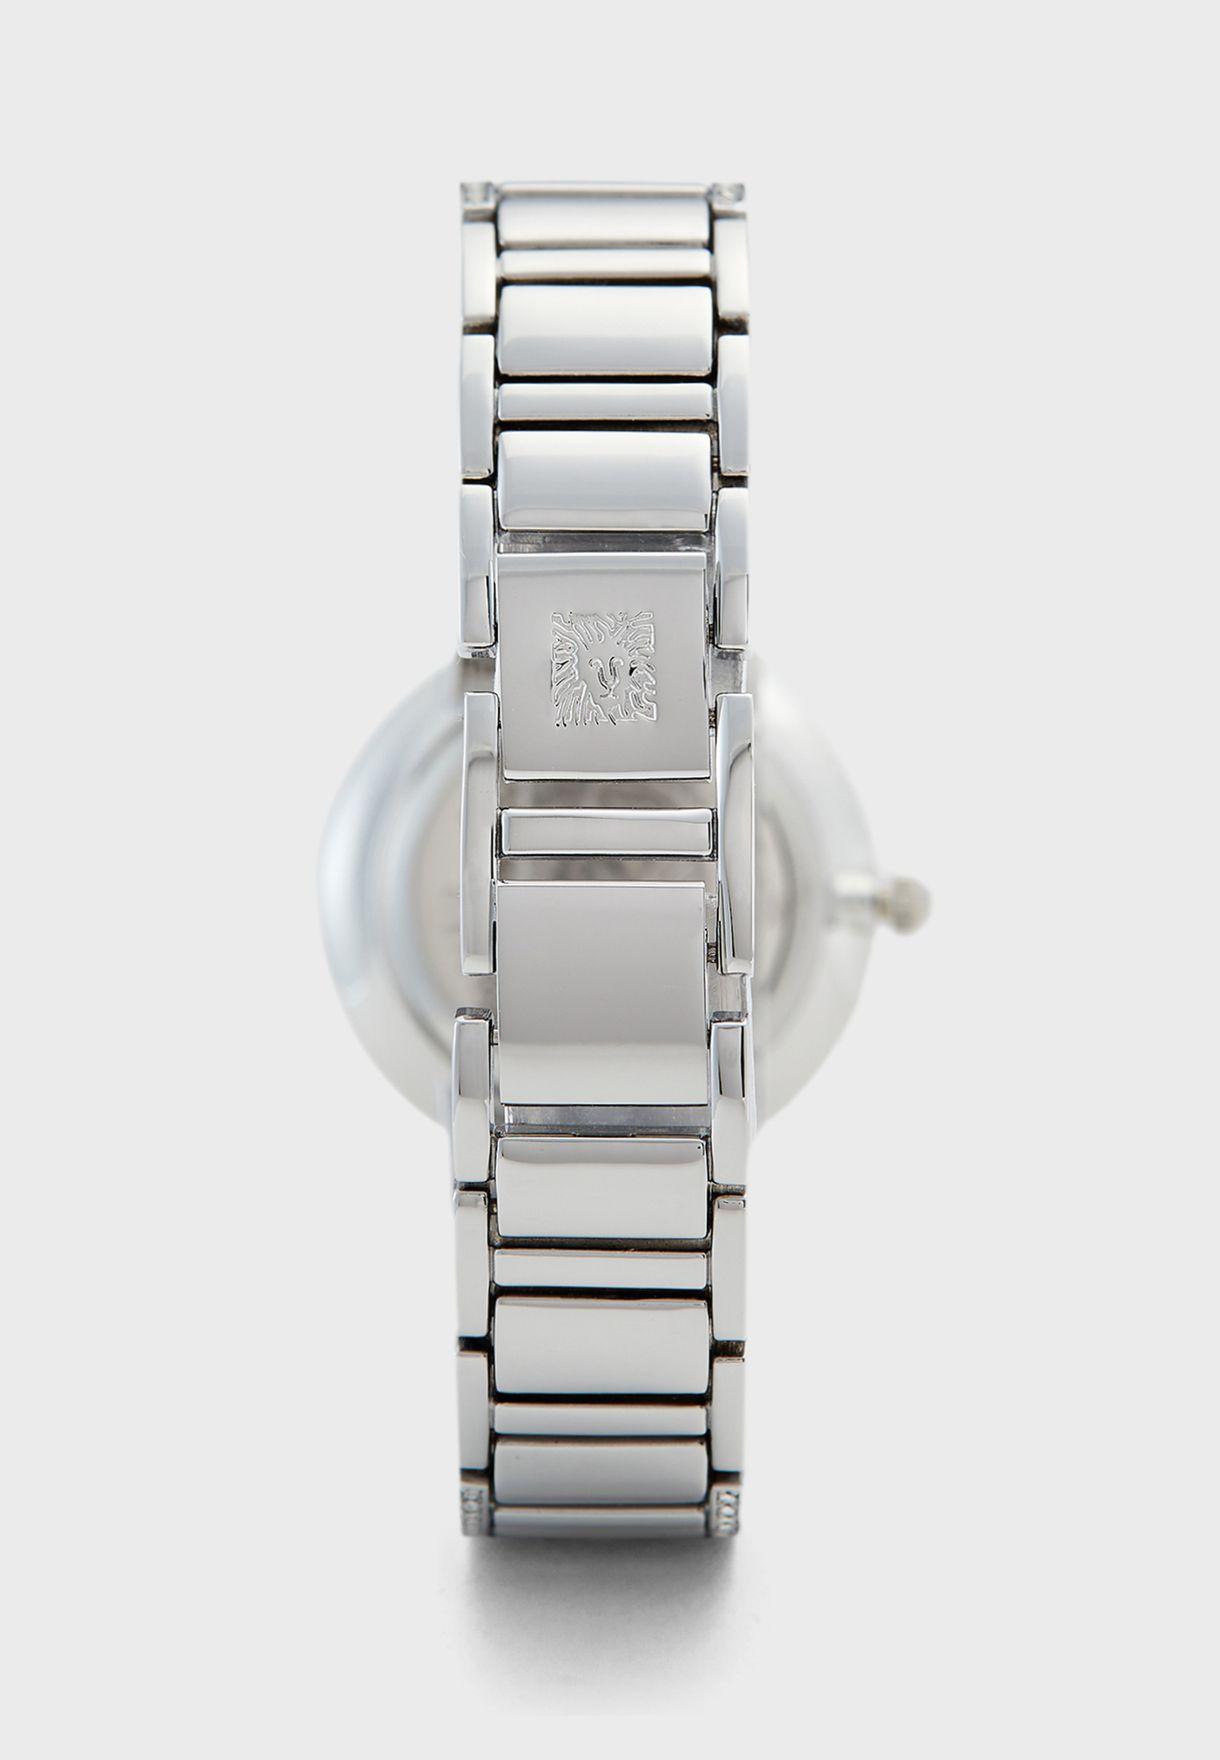 AK3201SVSV Steel Strap Analog Watch